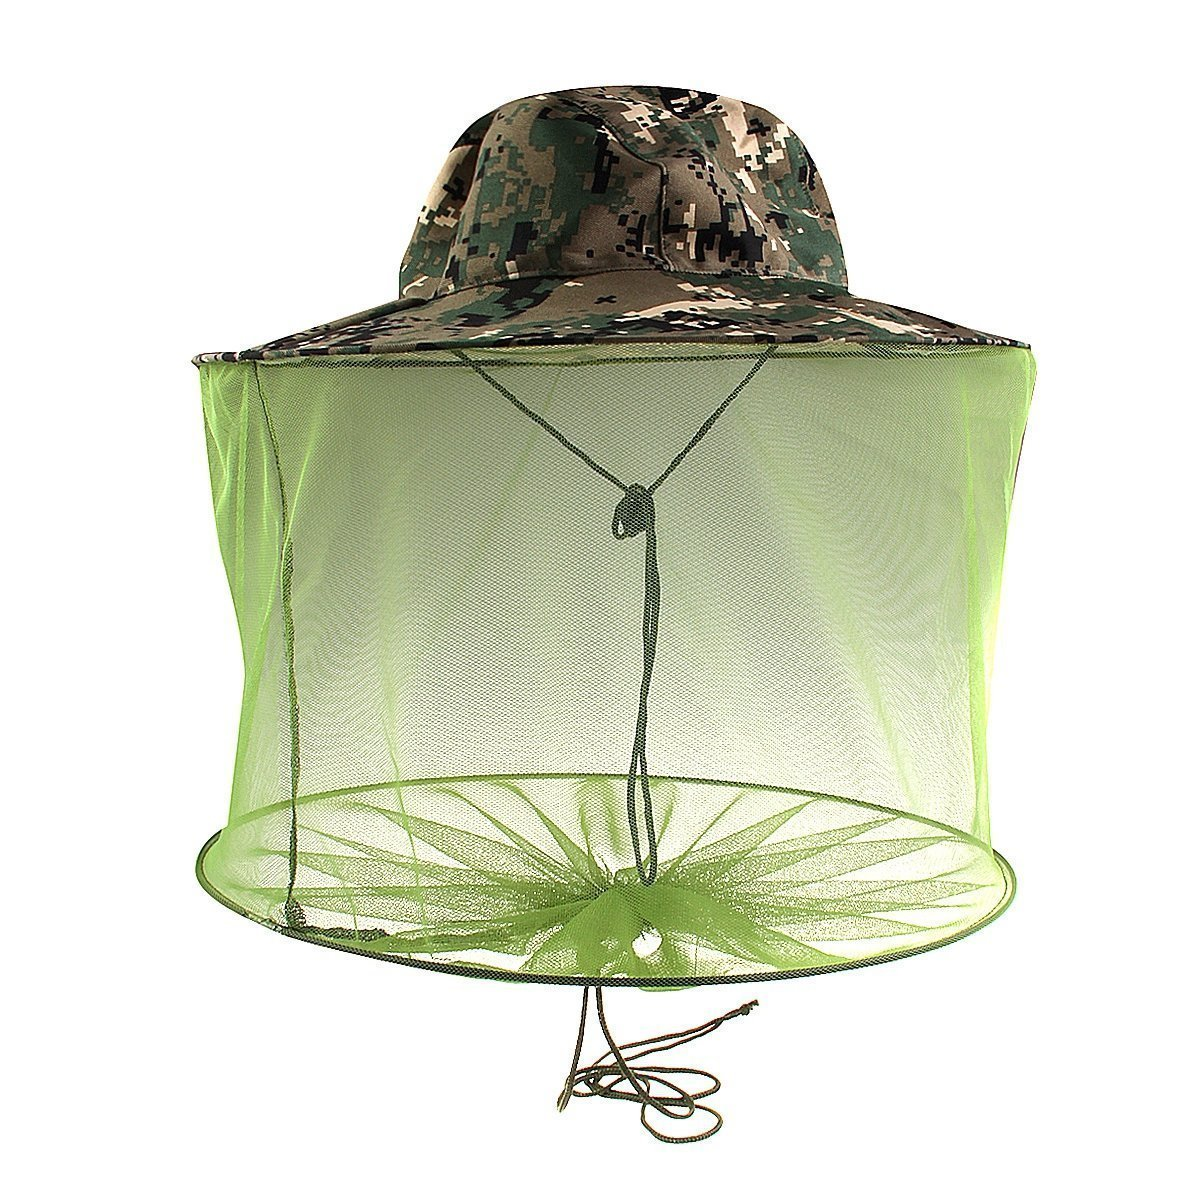 Yue life迷彩養蜂養蜂帽子anti-mosquito Beeバグ昆虫Hat with Head Netメッシュ B072MML662